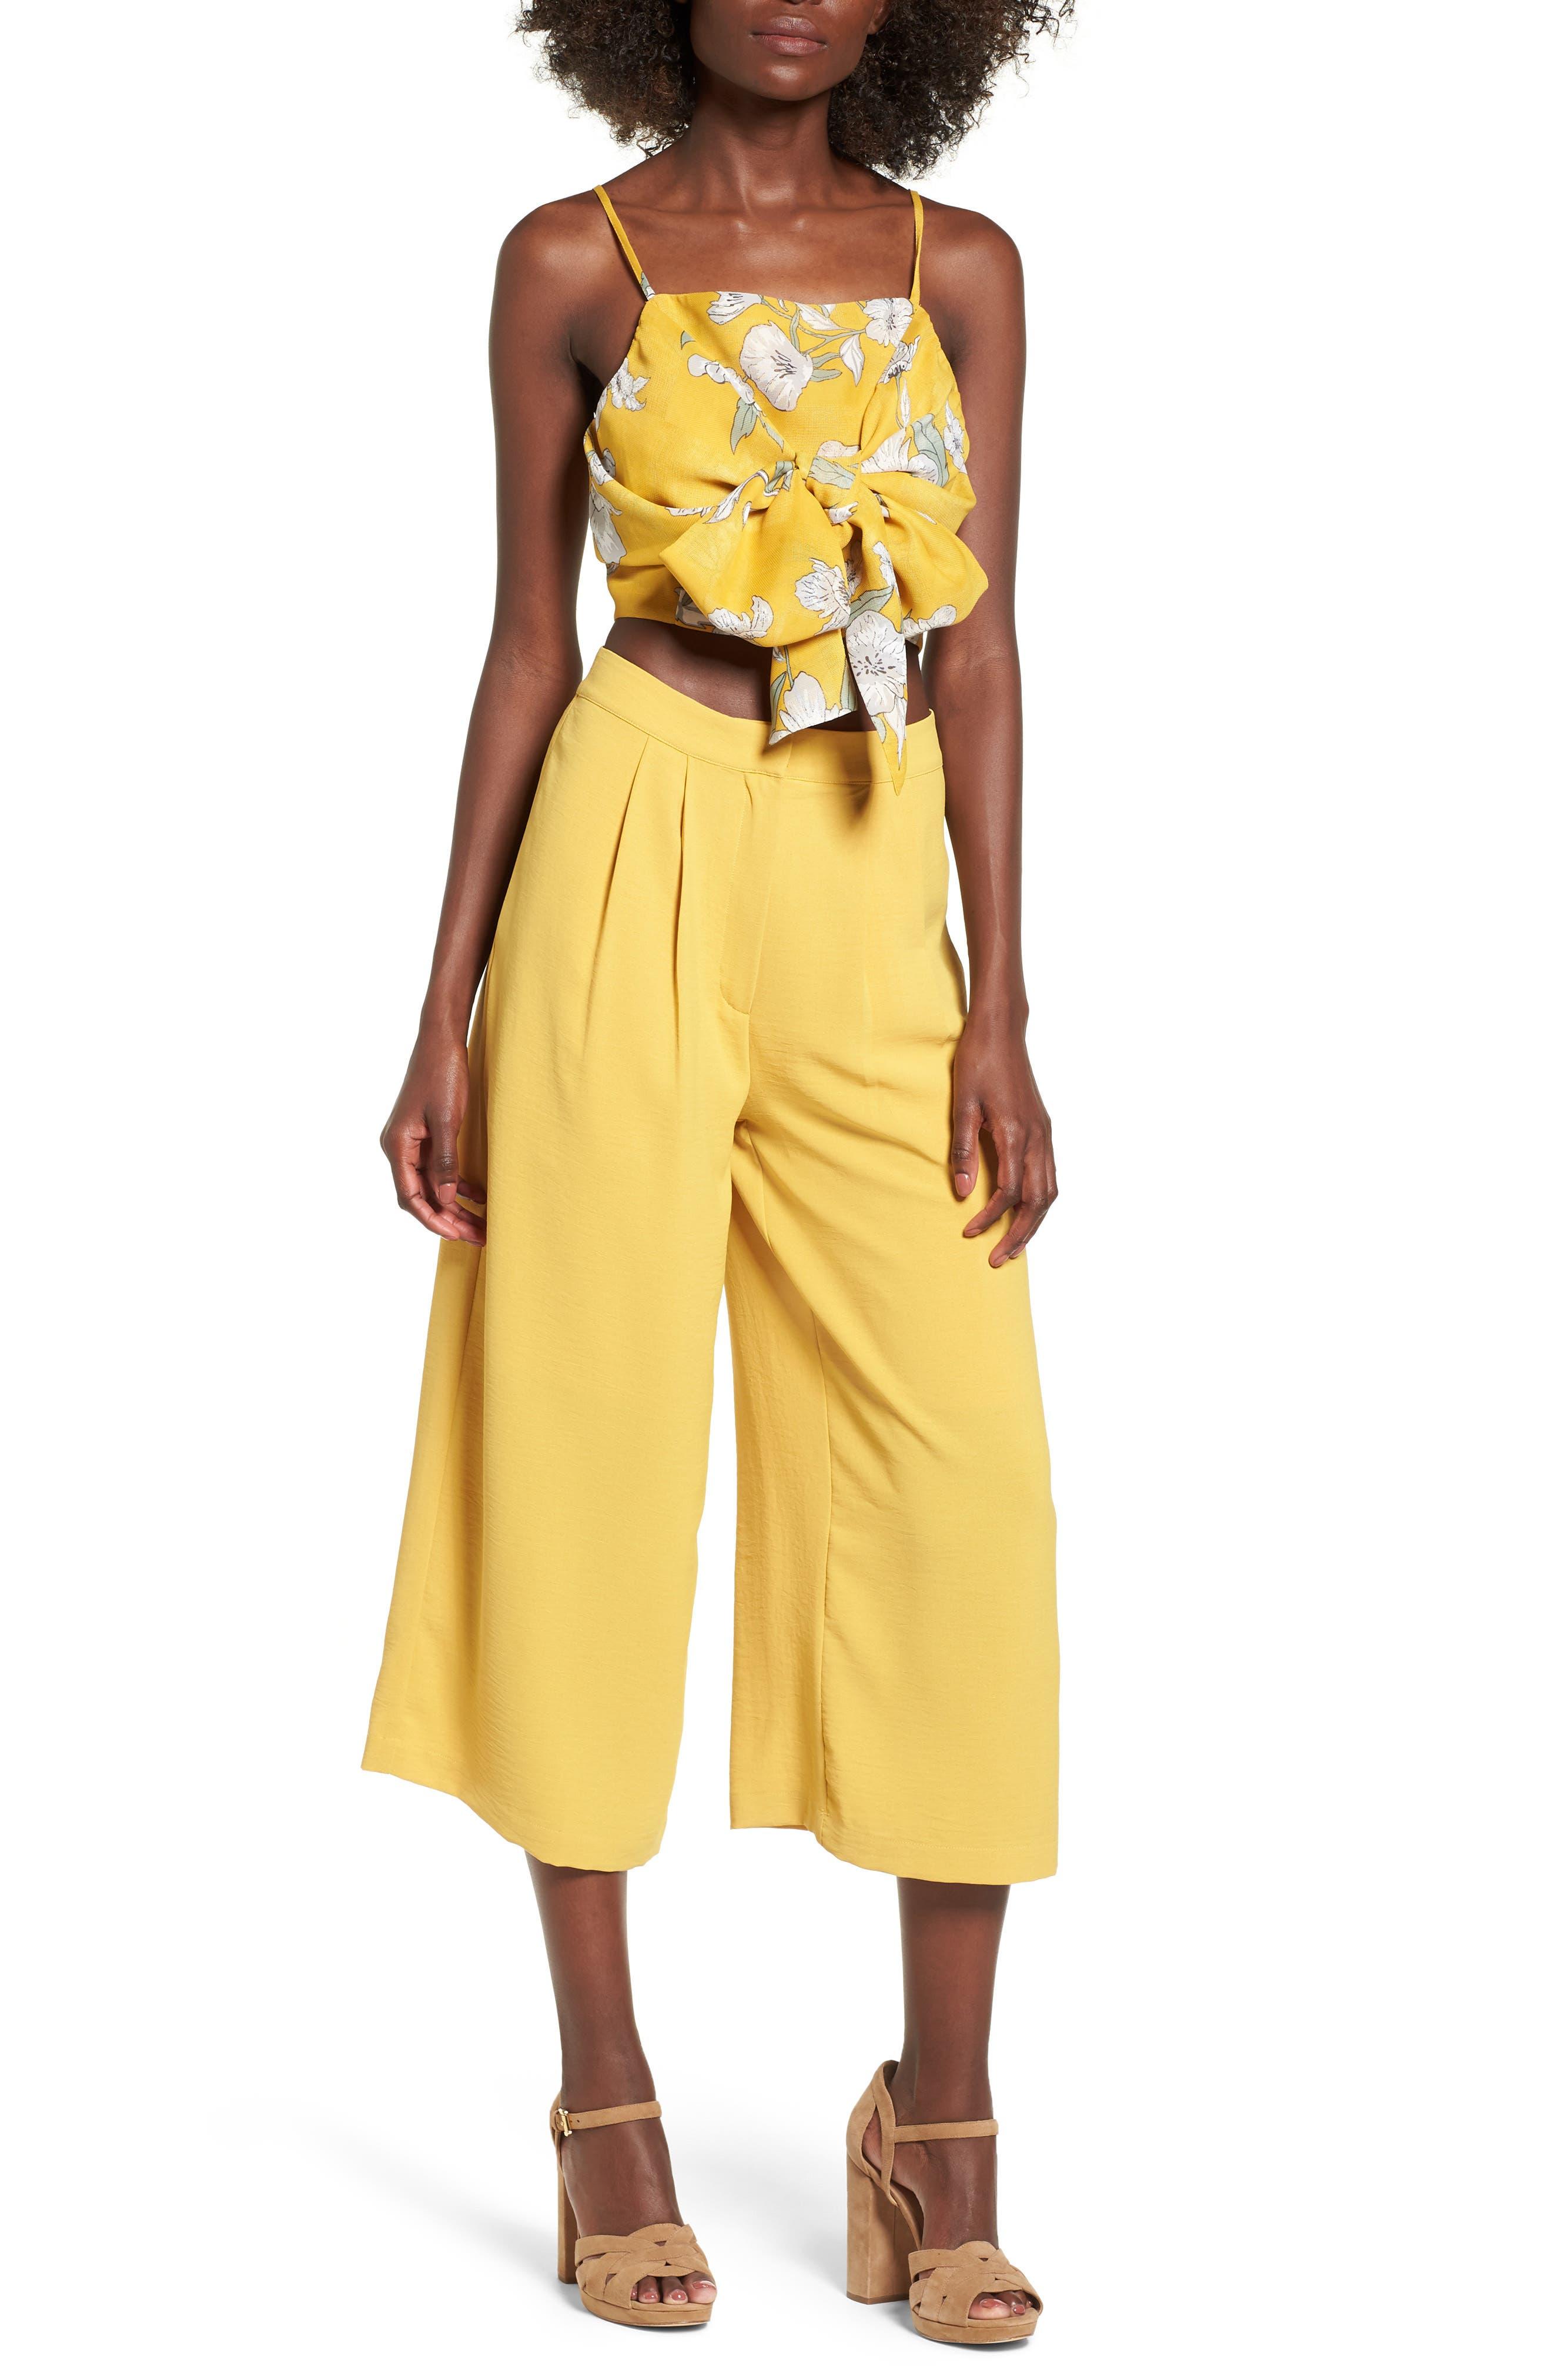 Chriselle x J.O.A. Pleat High Waist Crop Wide Leg Pants,                             Alternate thumbnail 3, color,                             Roman Gold